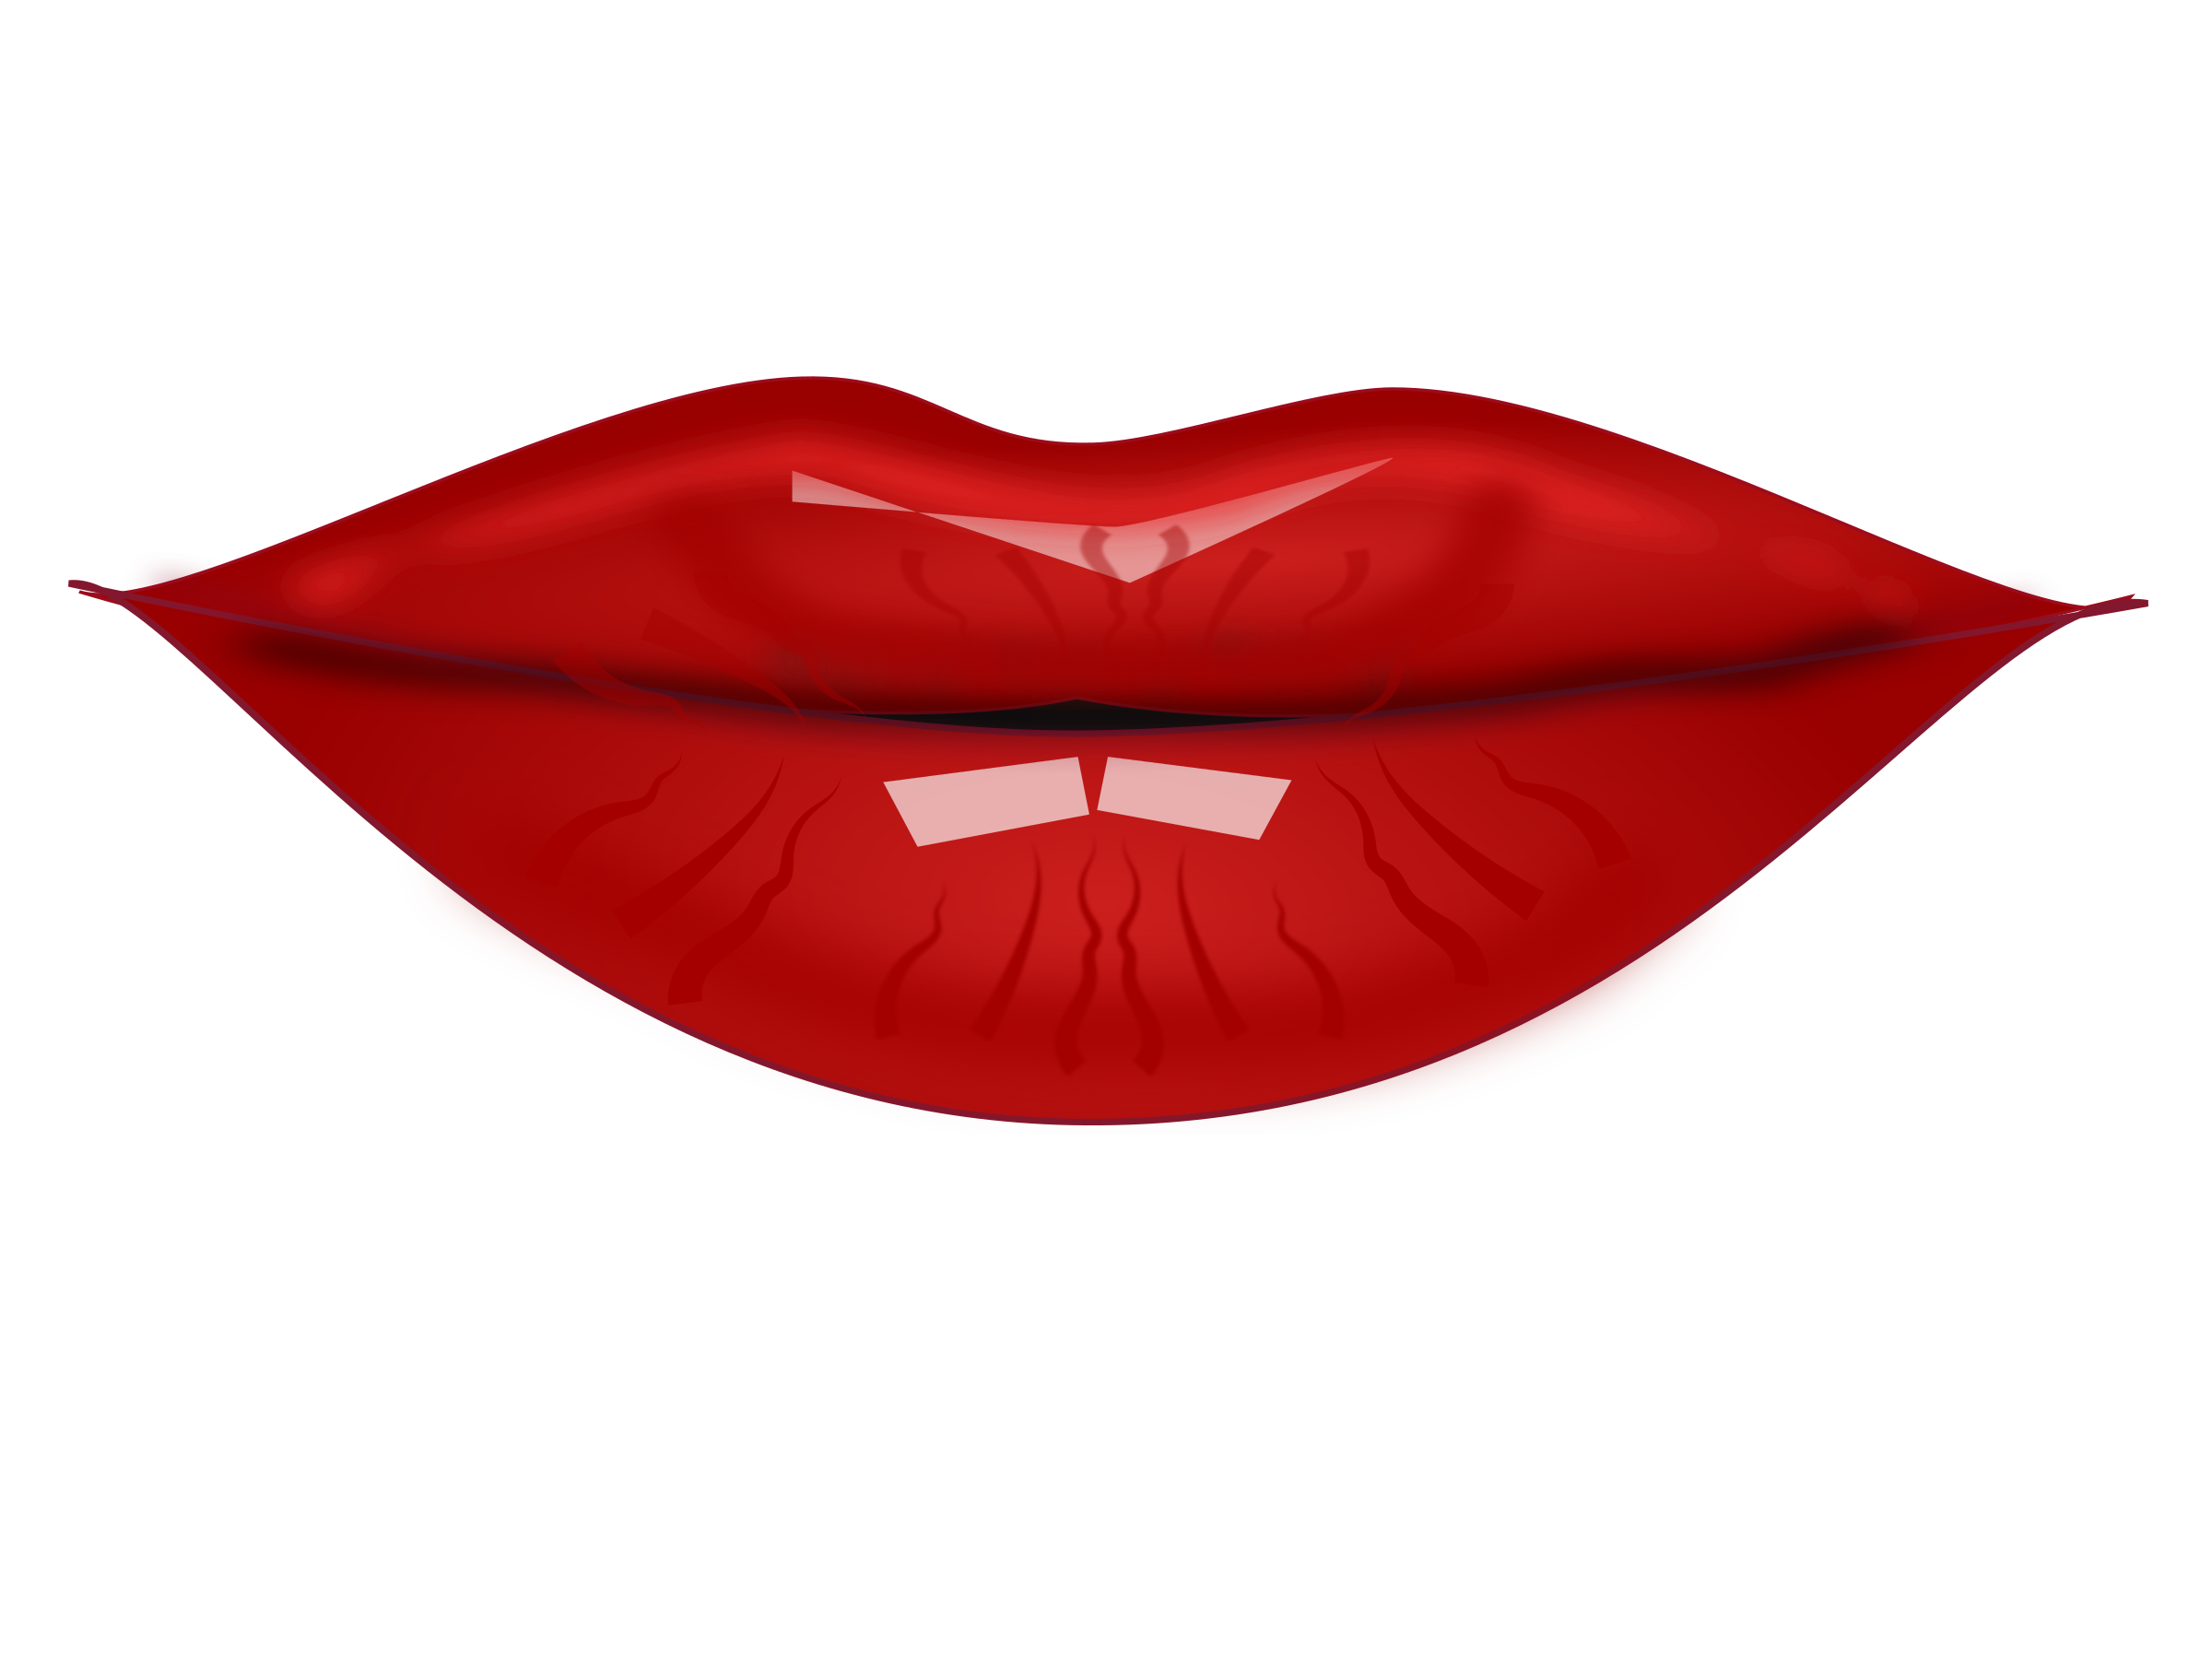 Lips clipart lip balm By Lips Clipart netalloy Lips